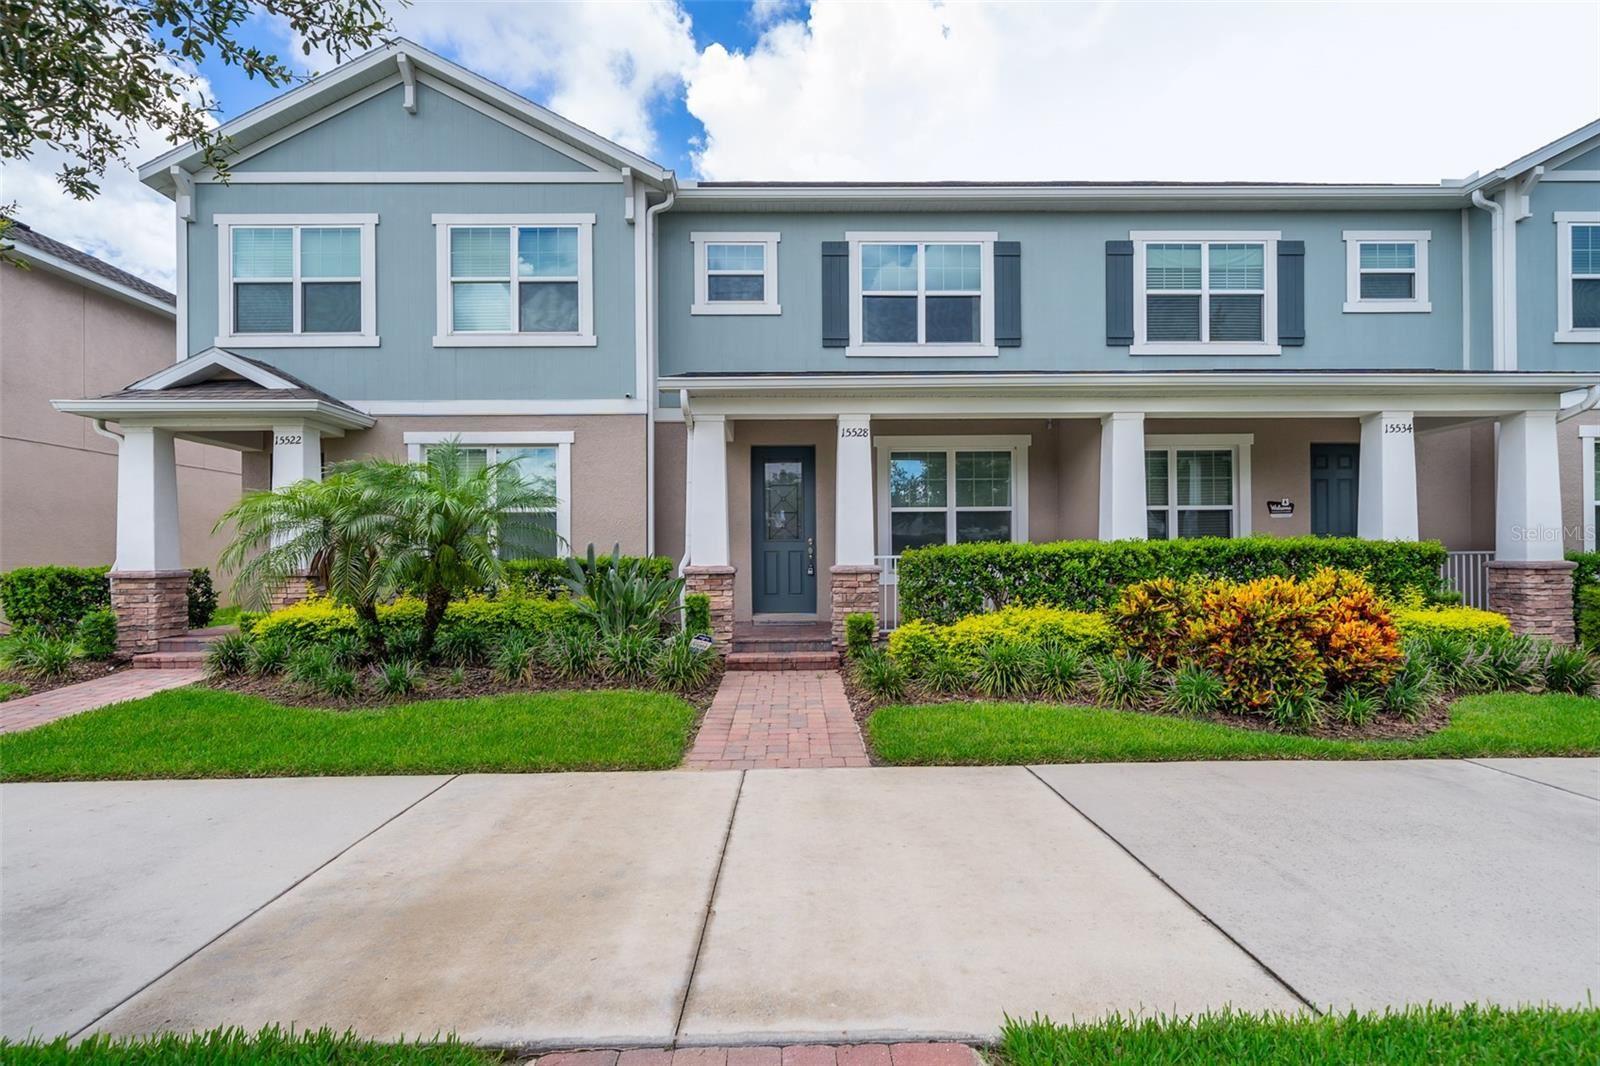 15528 MURCOTT BLOSSOM BOULEVARD, Winter Garden, FL 34787 - #: O5956408